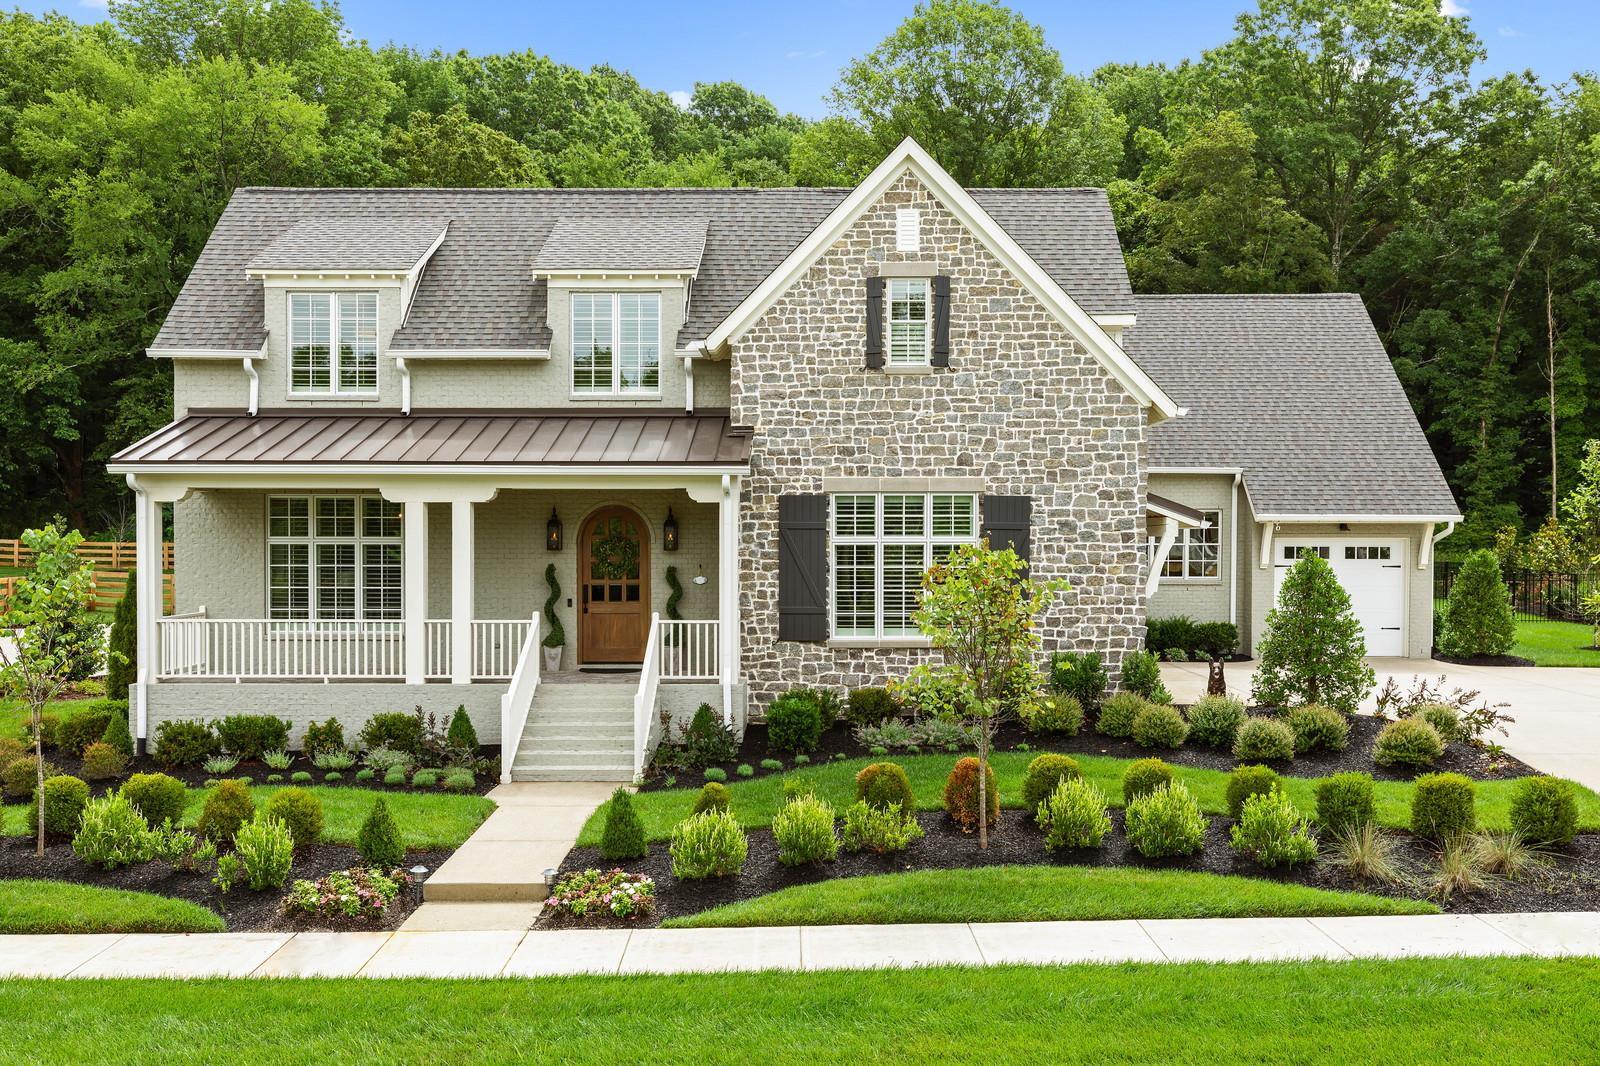 8544 Heirloom, College Grove, TN 37046 - College Grove, TN real estate listing